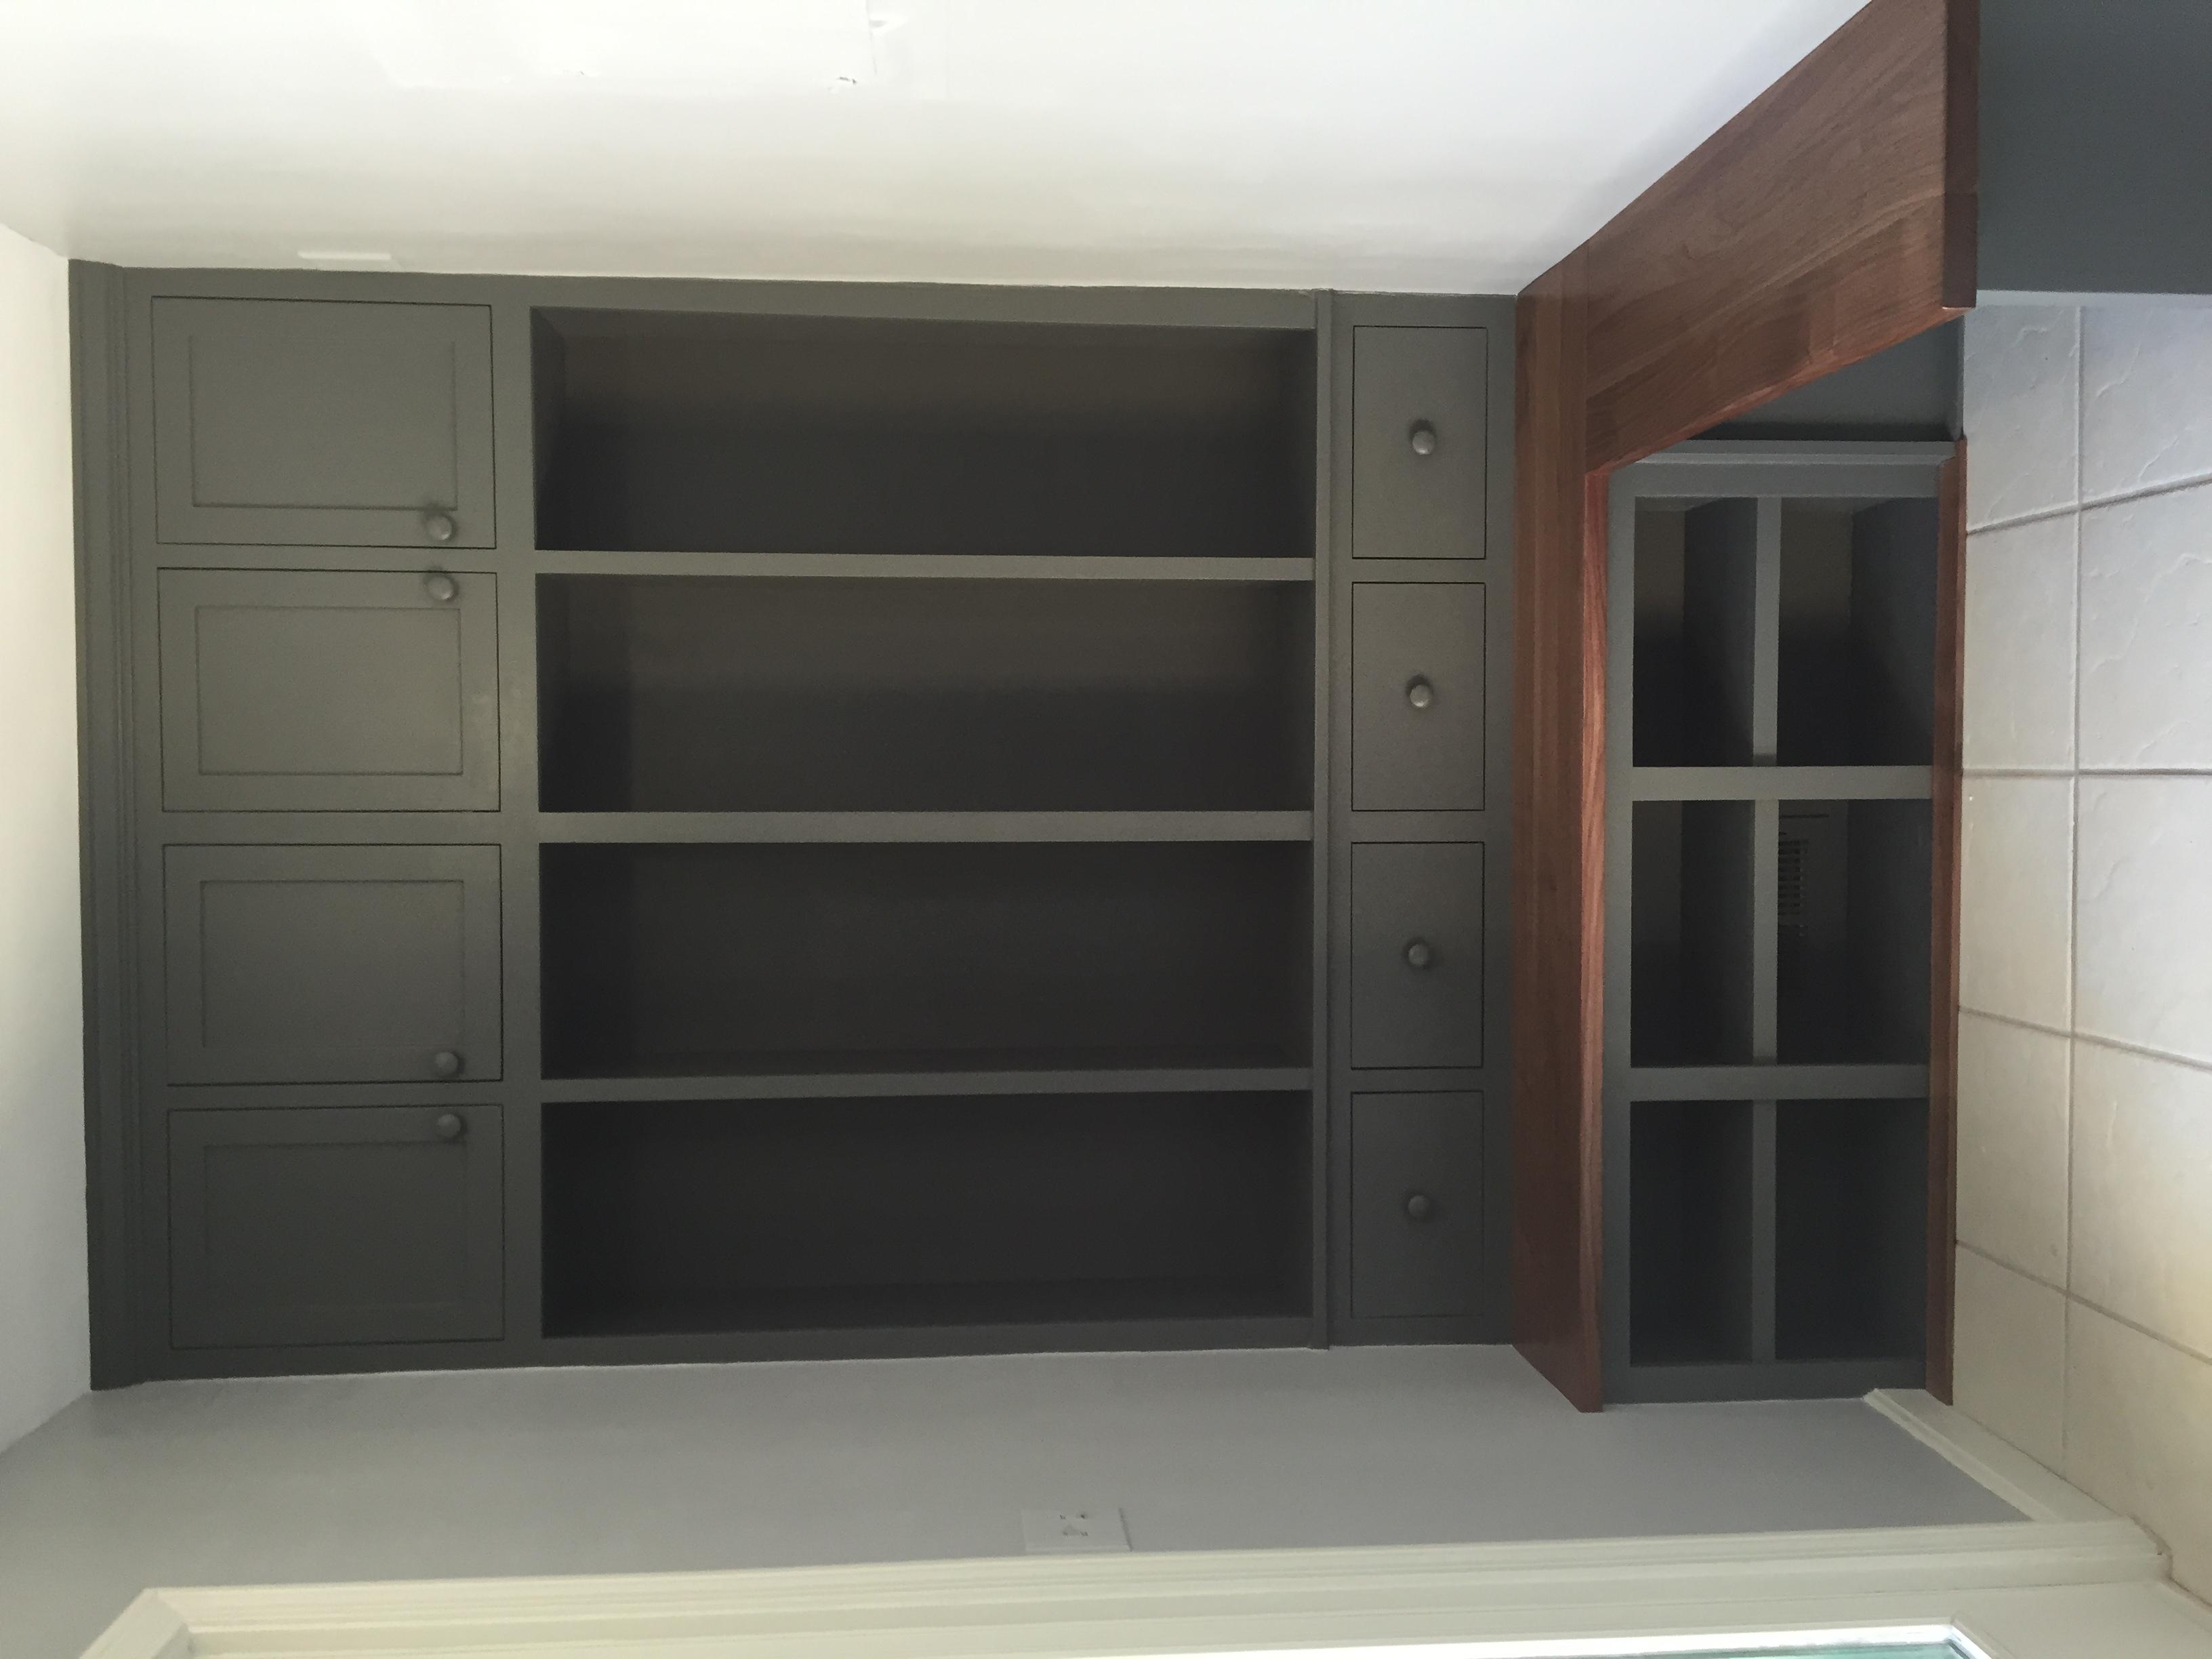 Walnut Mudroom Cabinetry